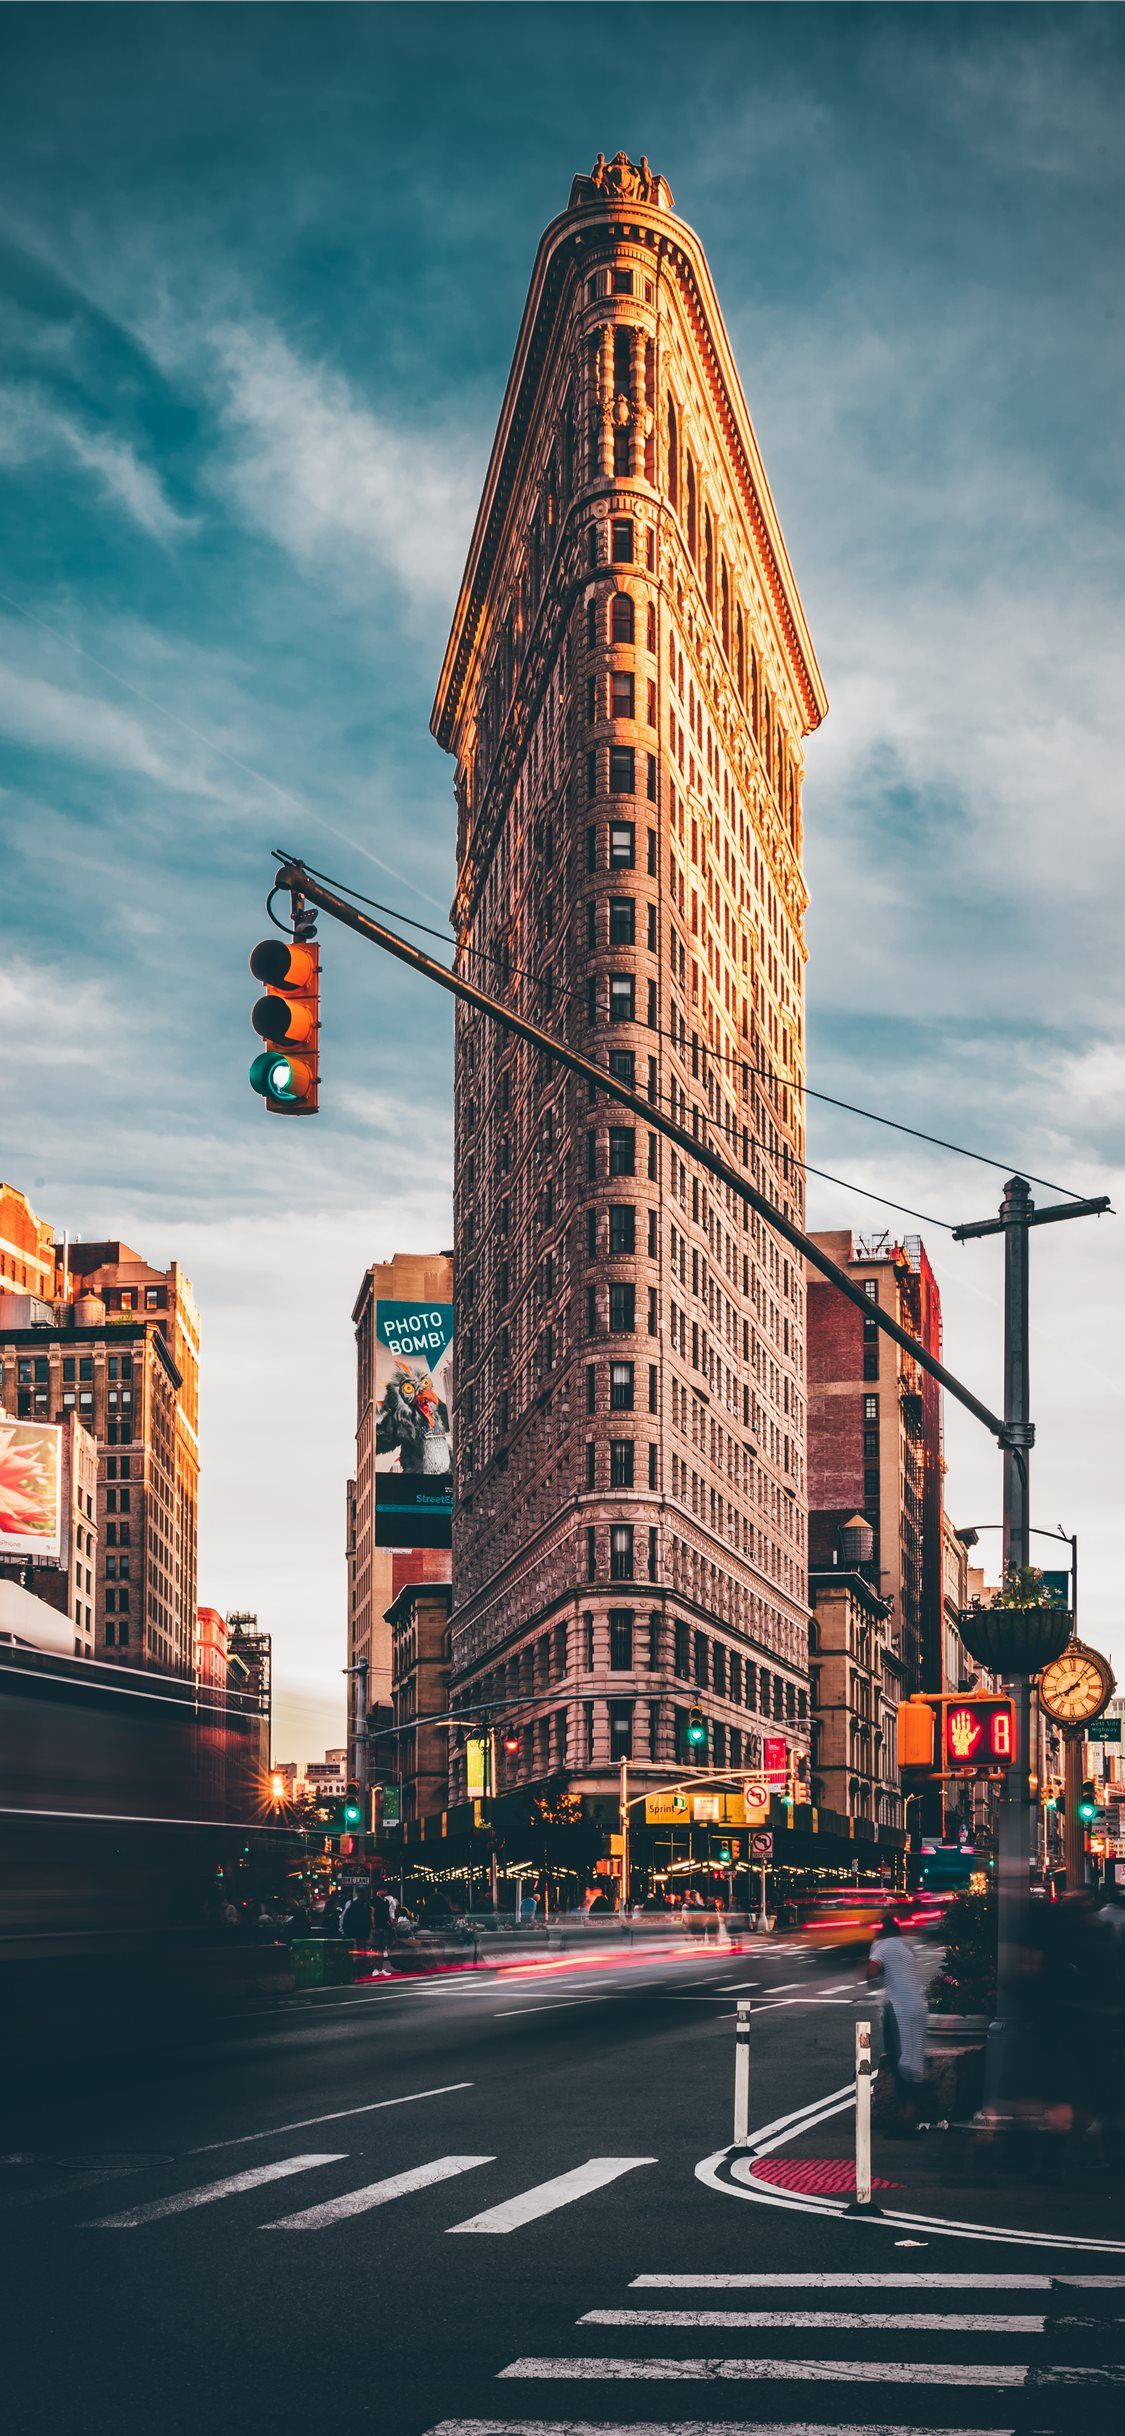 Flatiron Building New York United States iPhone X